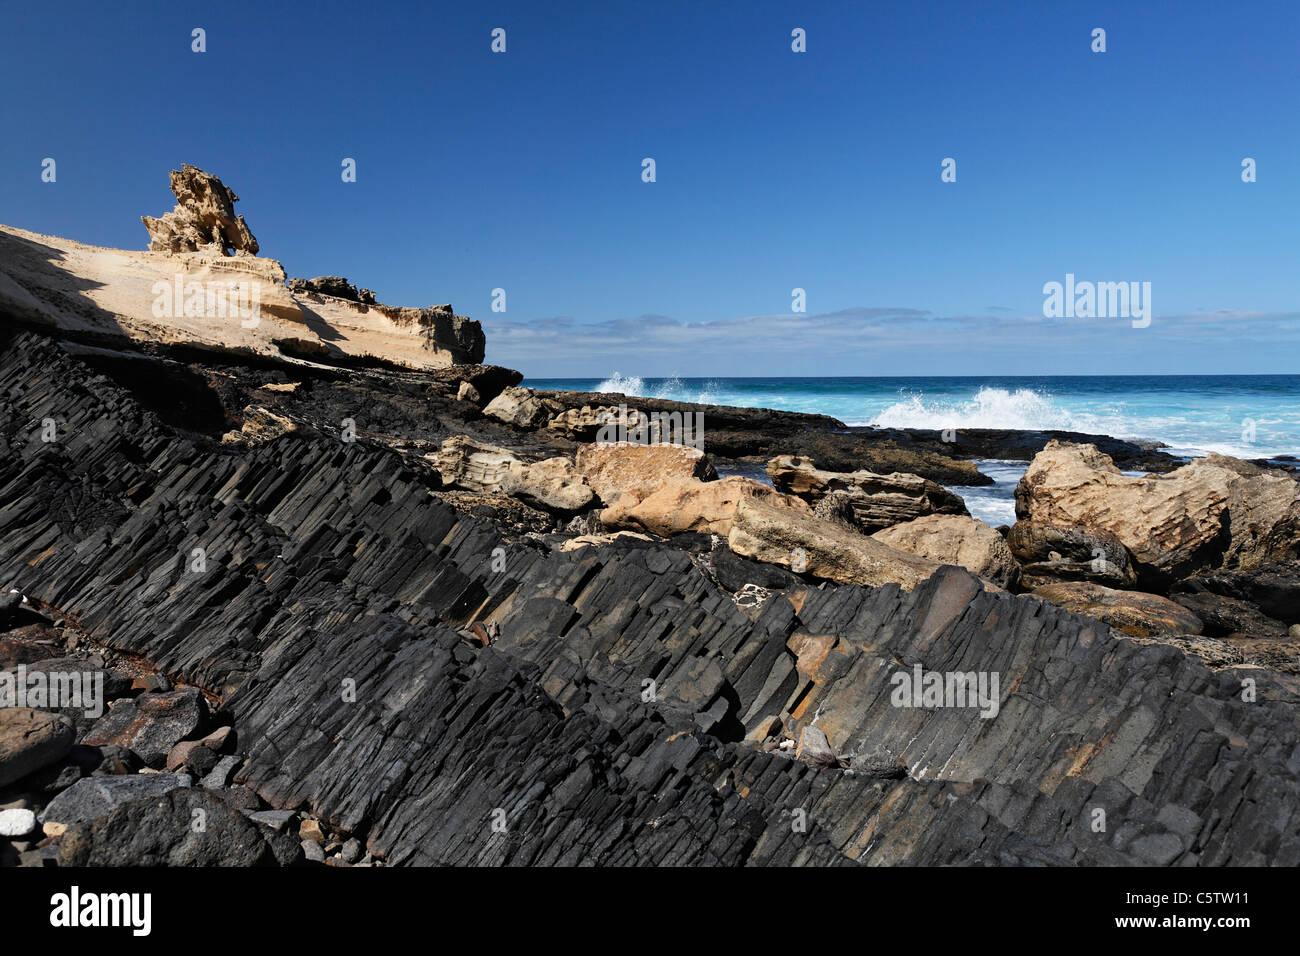 Spain, Canary Islands, Fuerteventura, Istmo de la Pared, Playa de Barlovento, Basalt rocks at beach - Stock Image